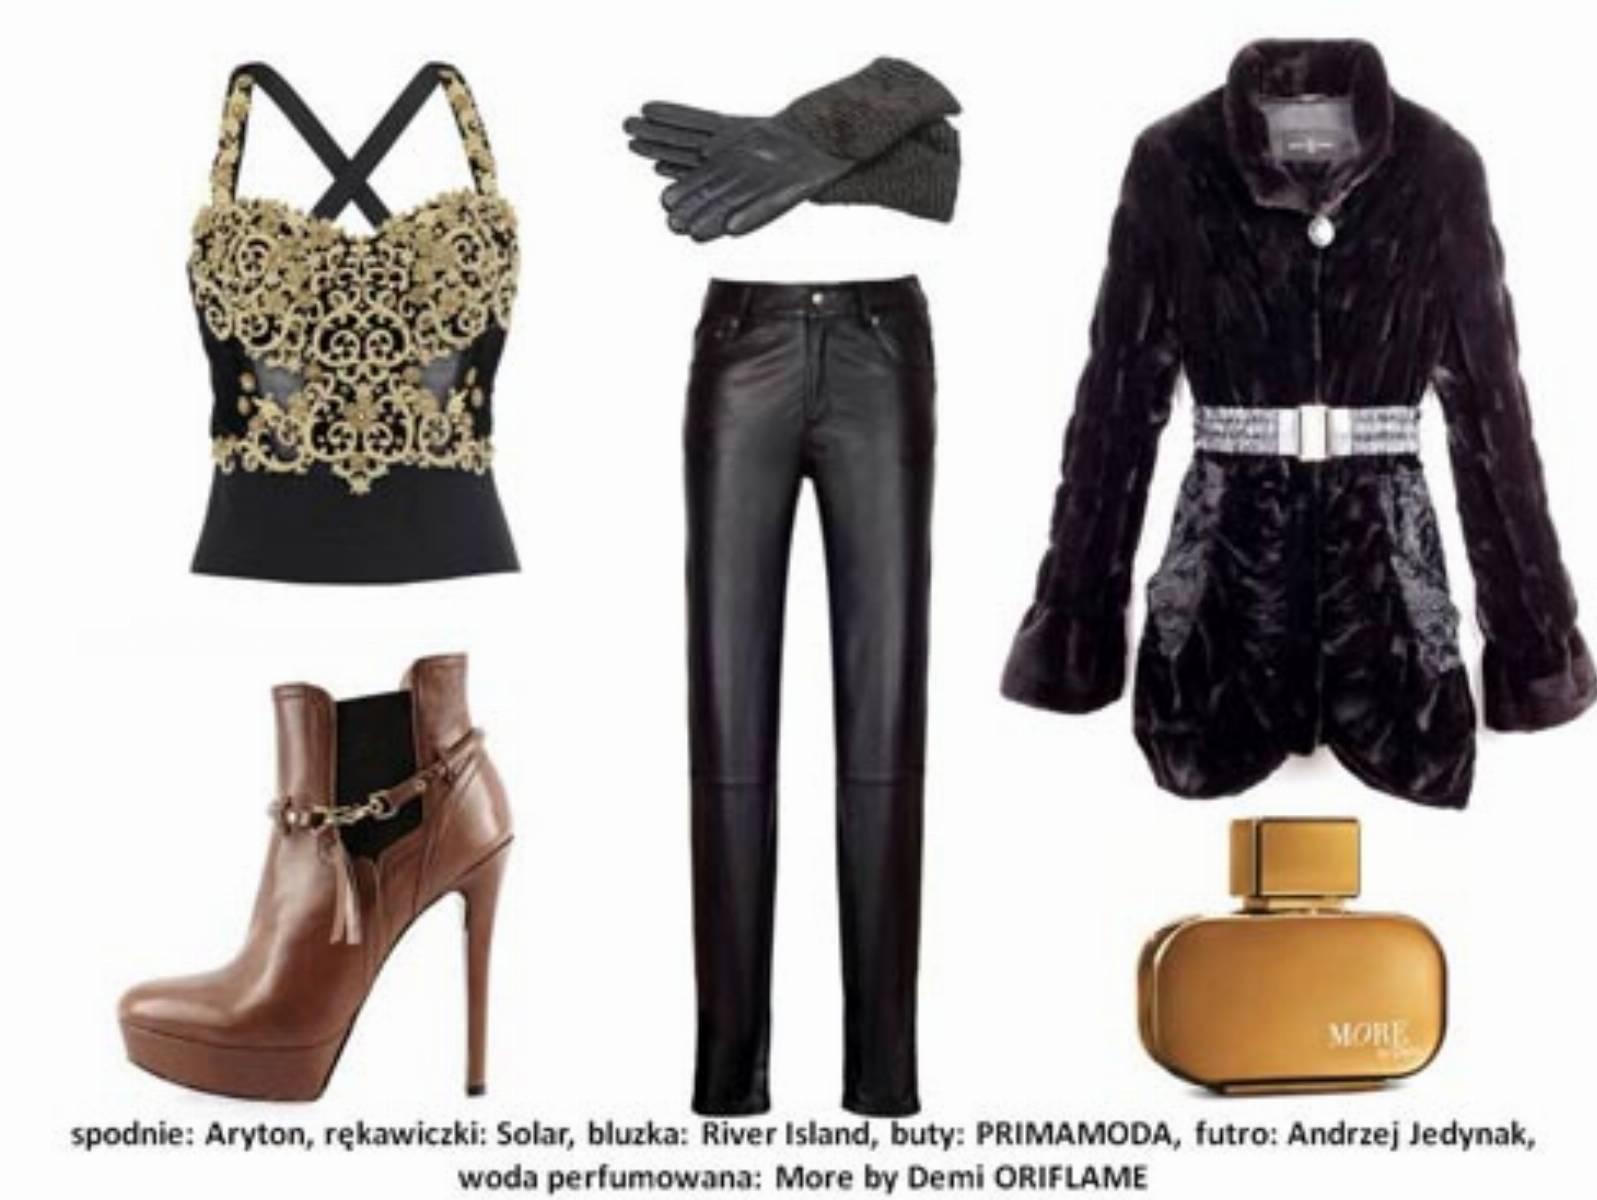 Barokowe królestwo mody